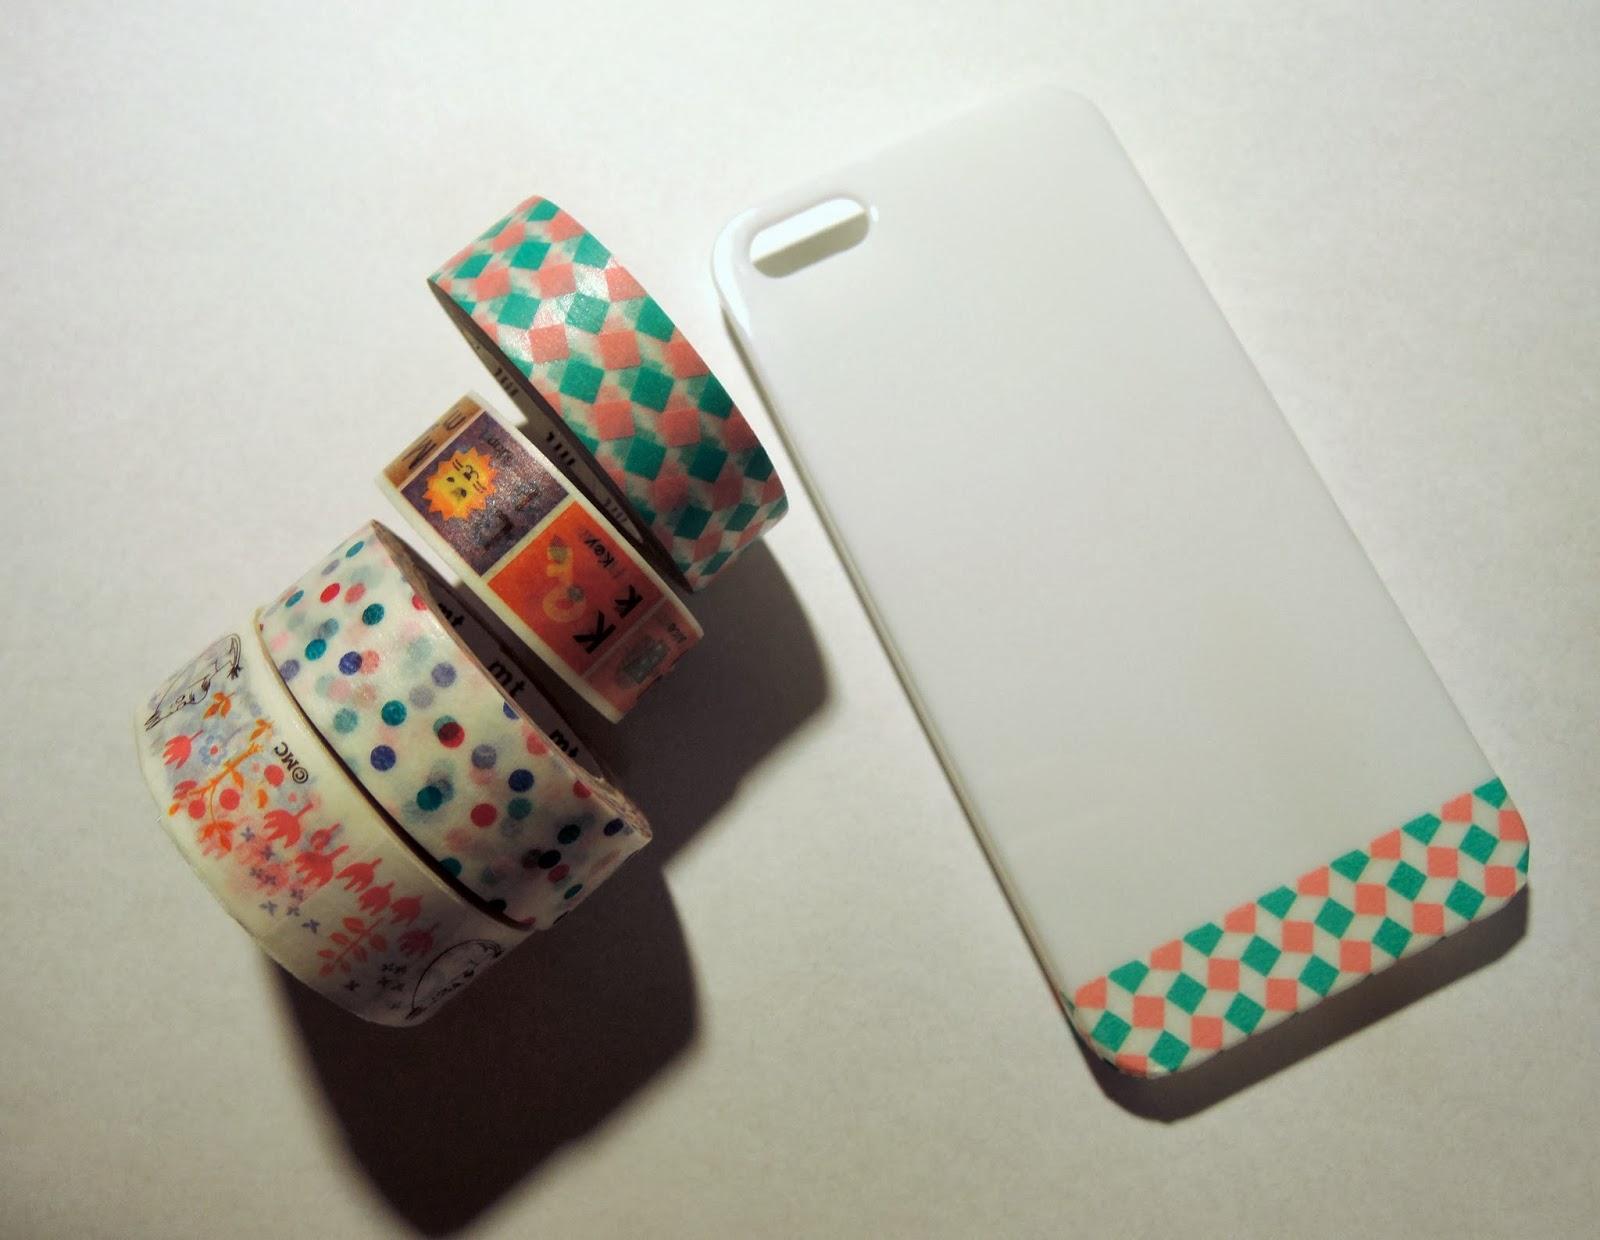 Meow box jewellery diy japanese washi tape phone case for Washi tape phone case